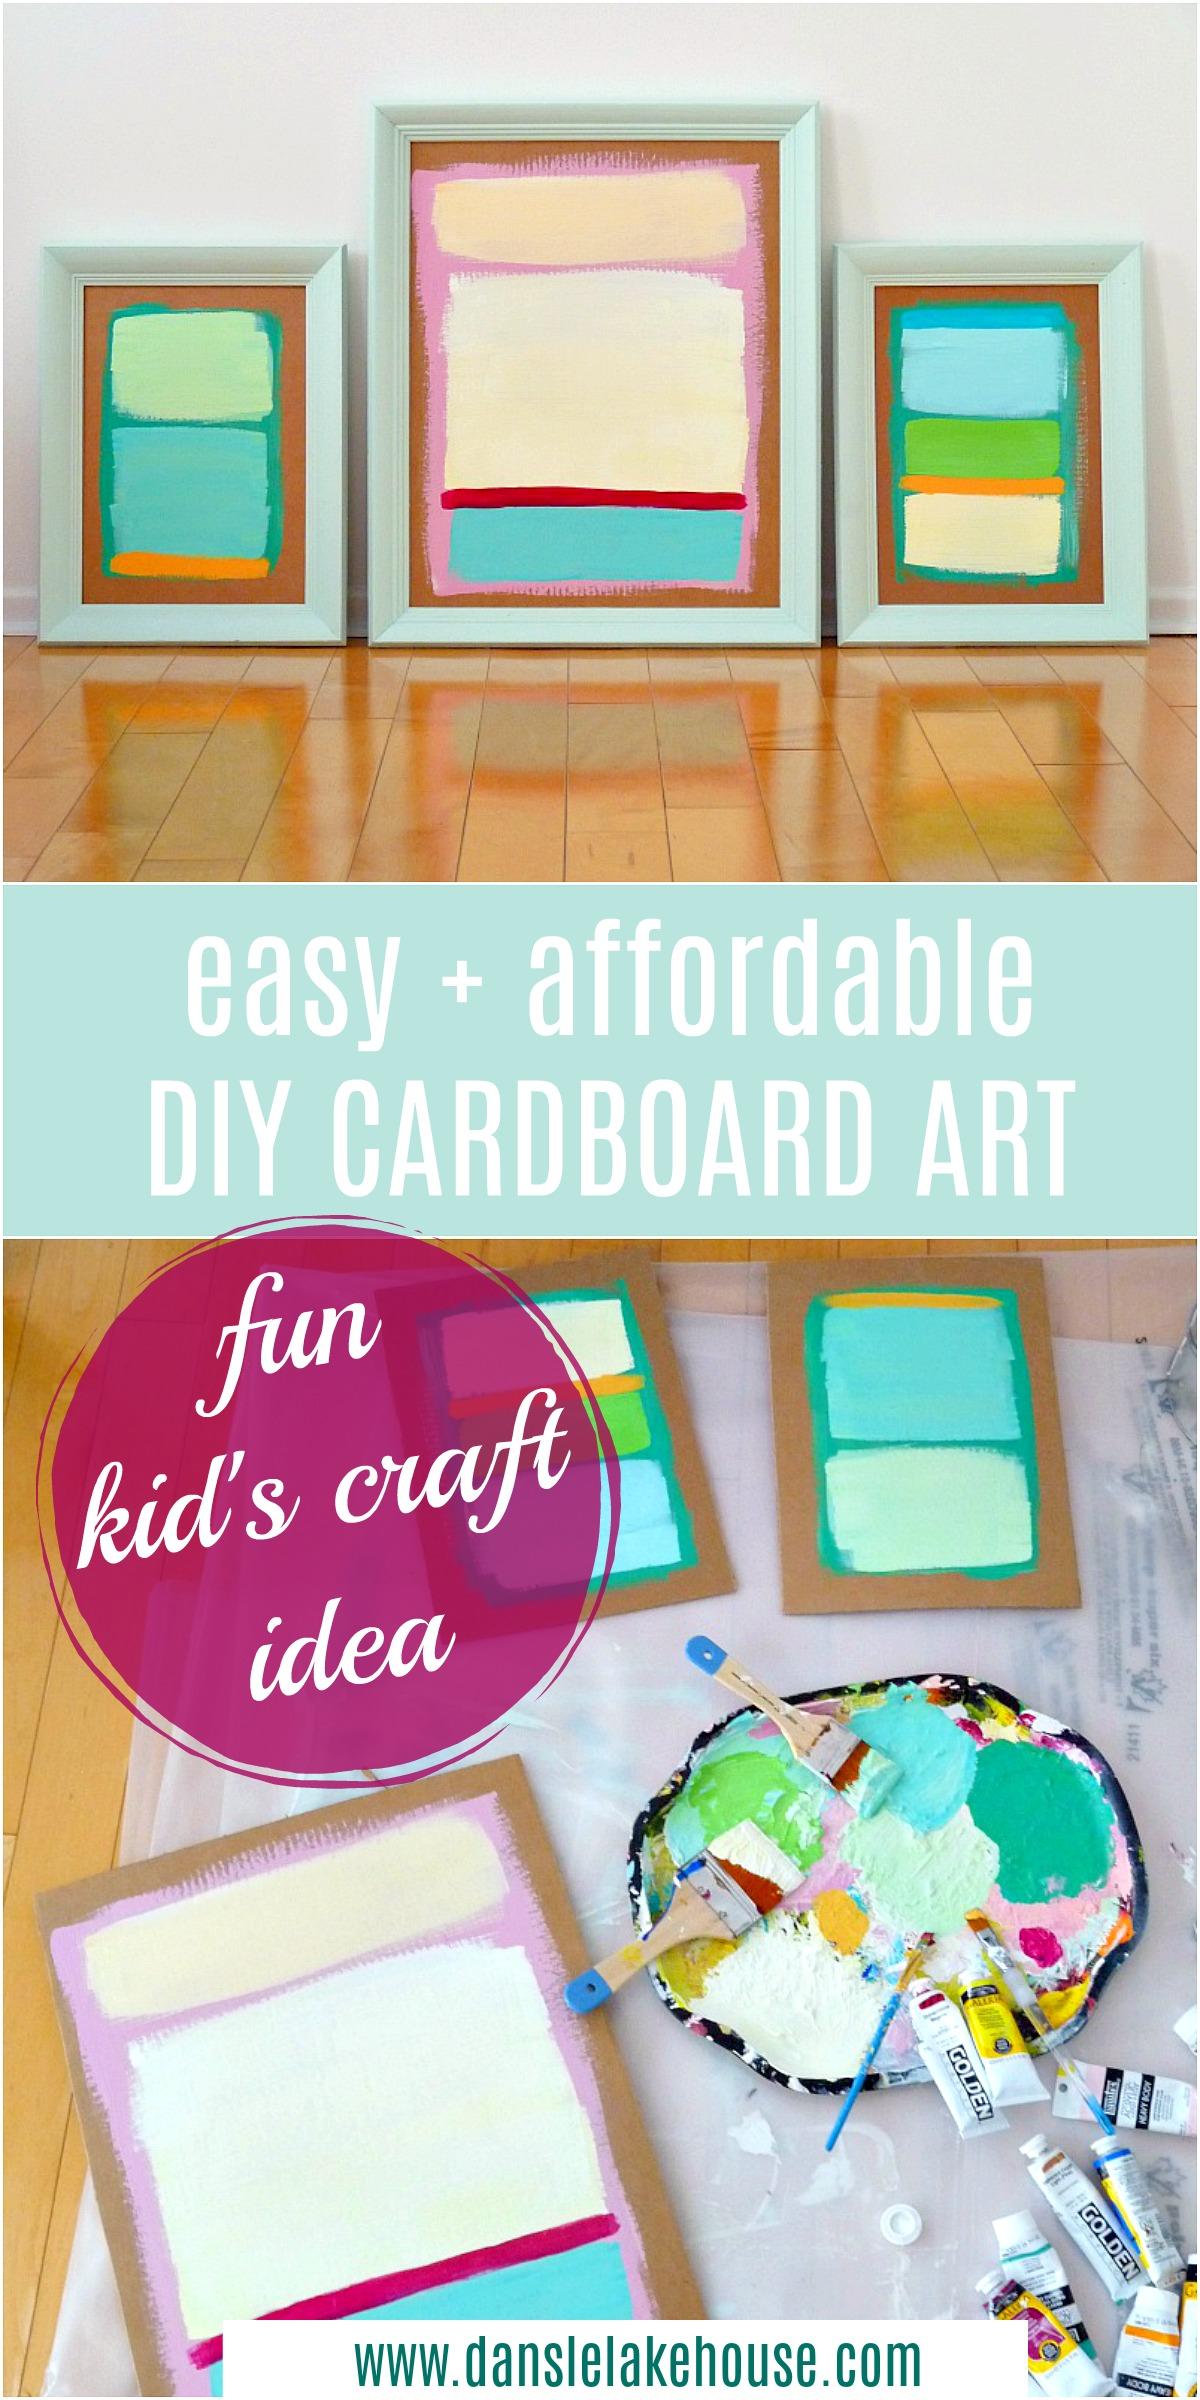 DIY cardboard art project for kids